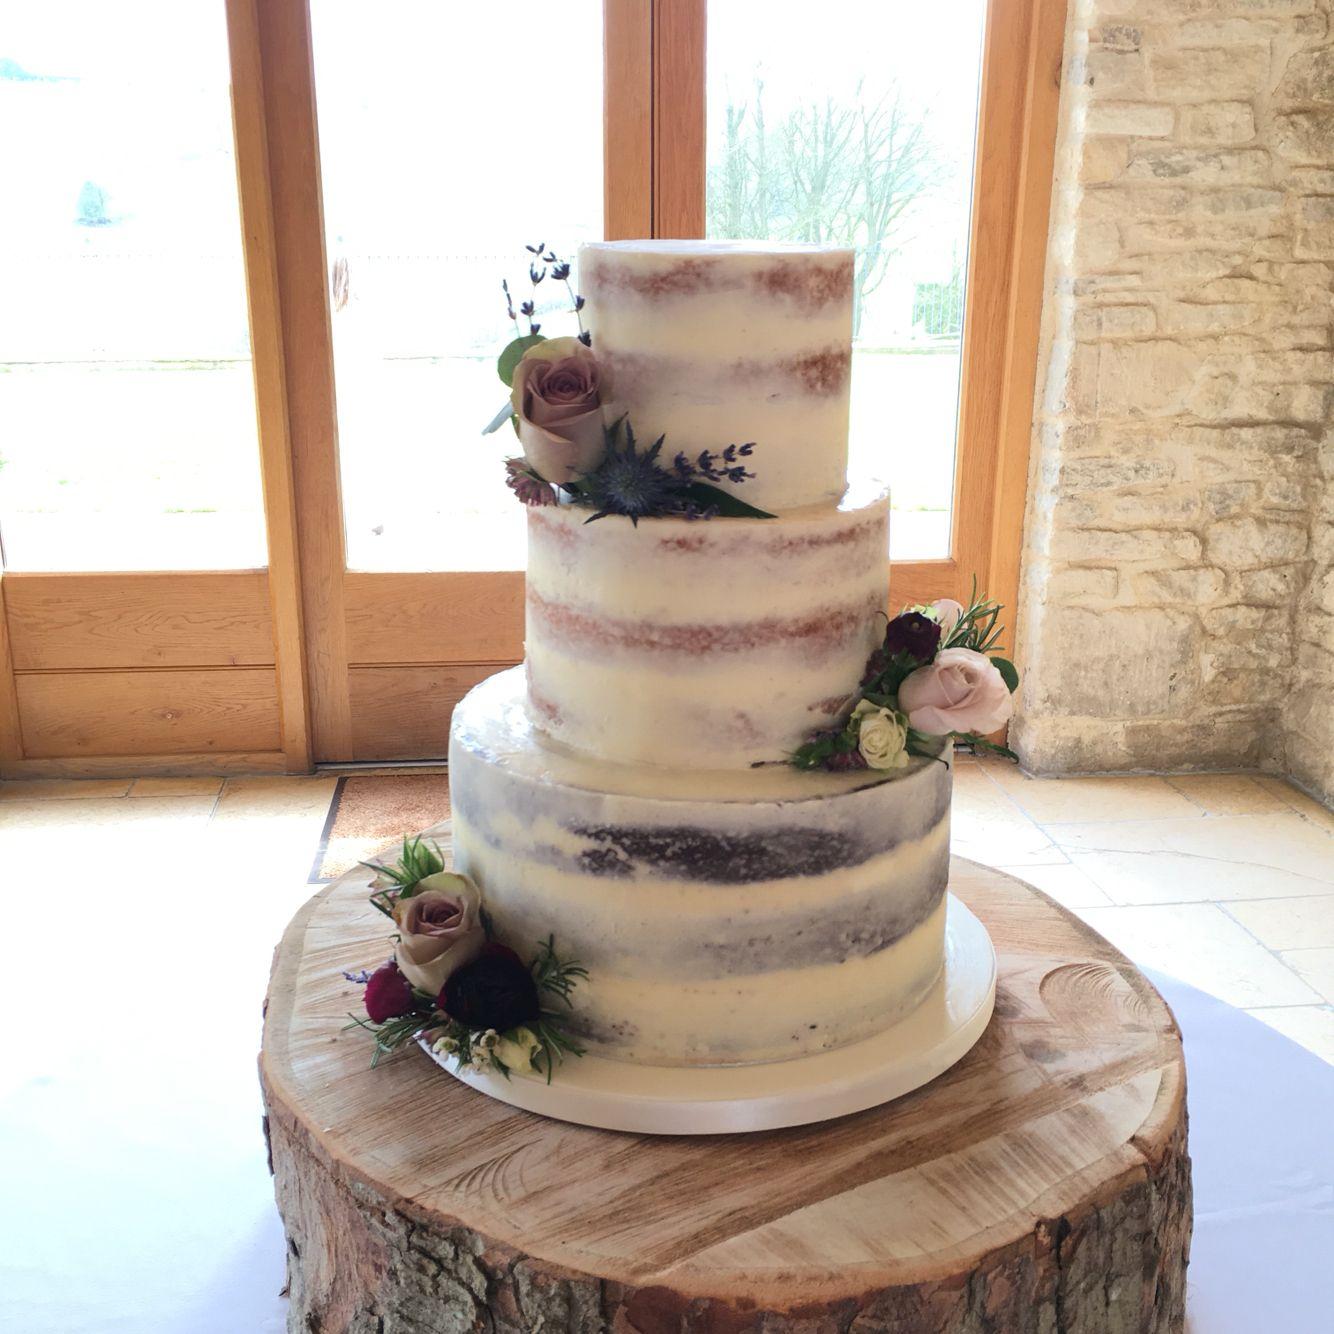 Semi Naked Cake With Fresh Flowers At Kingscote Barn